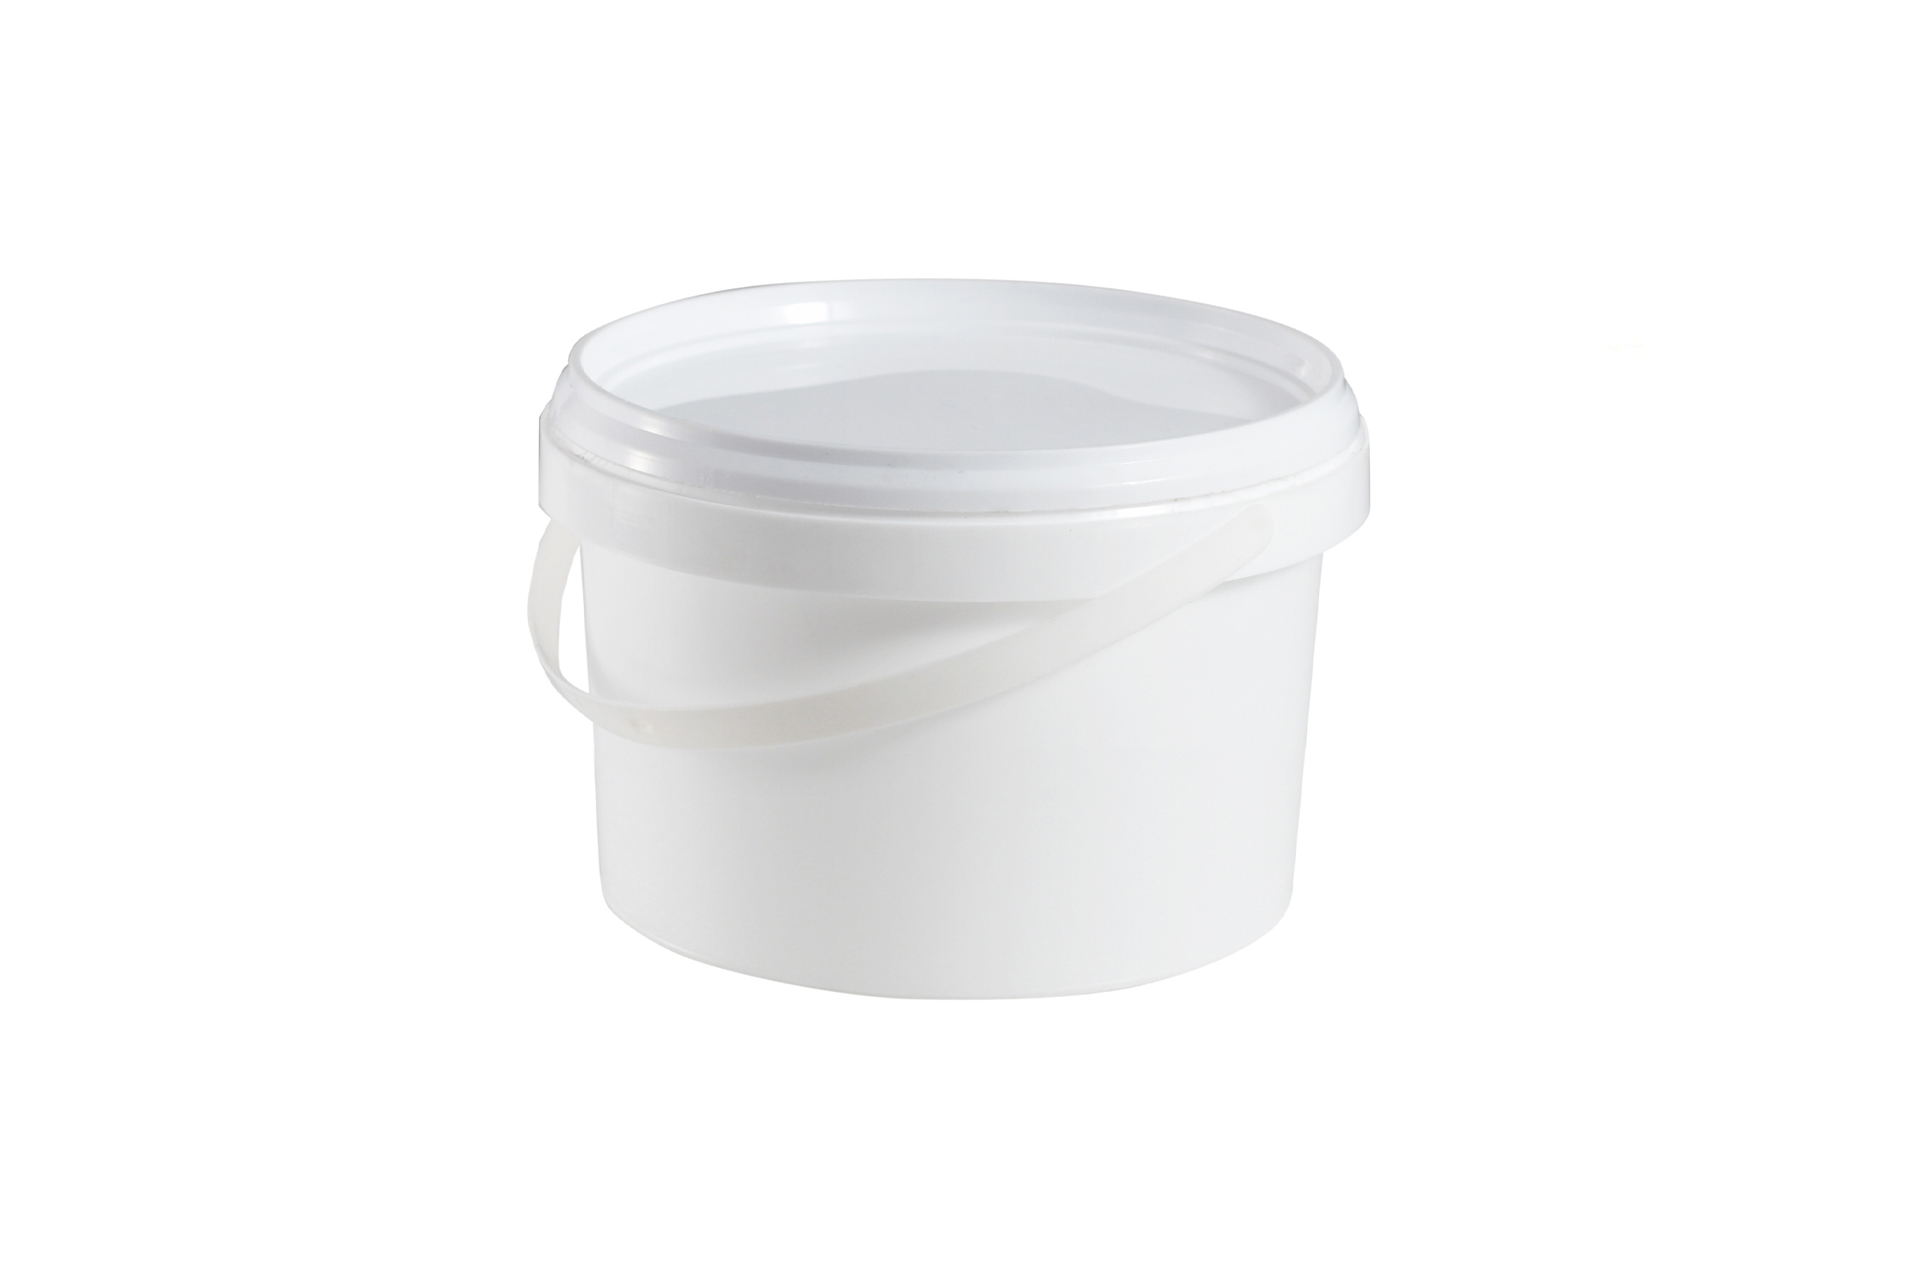 Jar of acrylic-based water dispersion adhesive